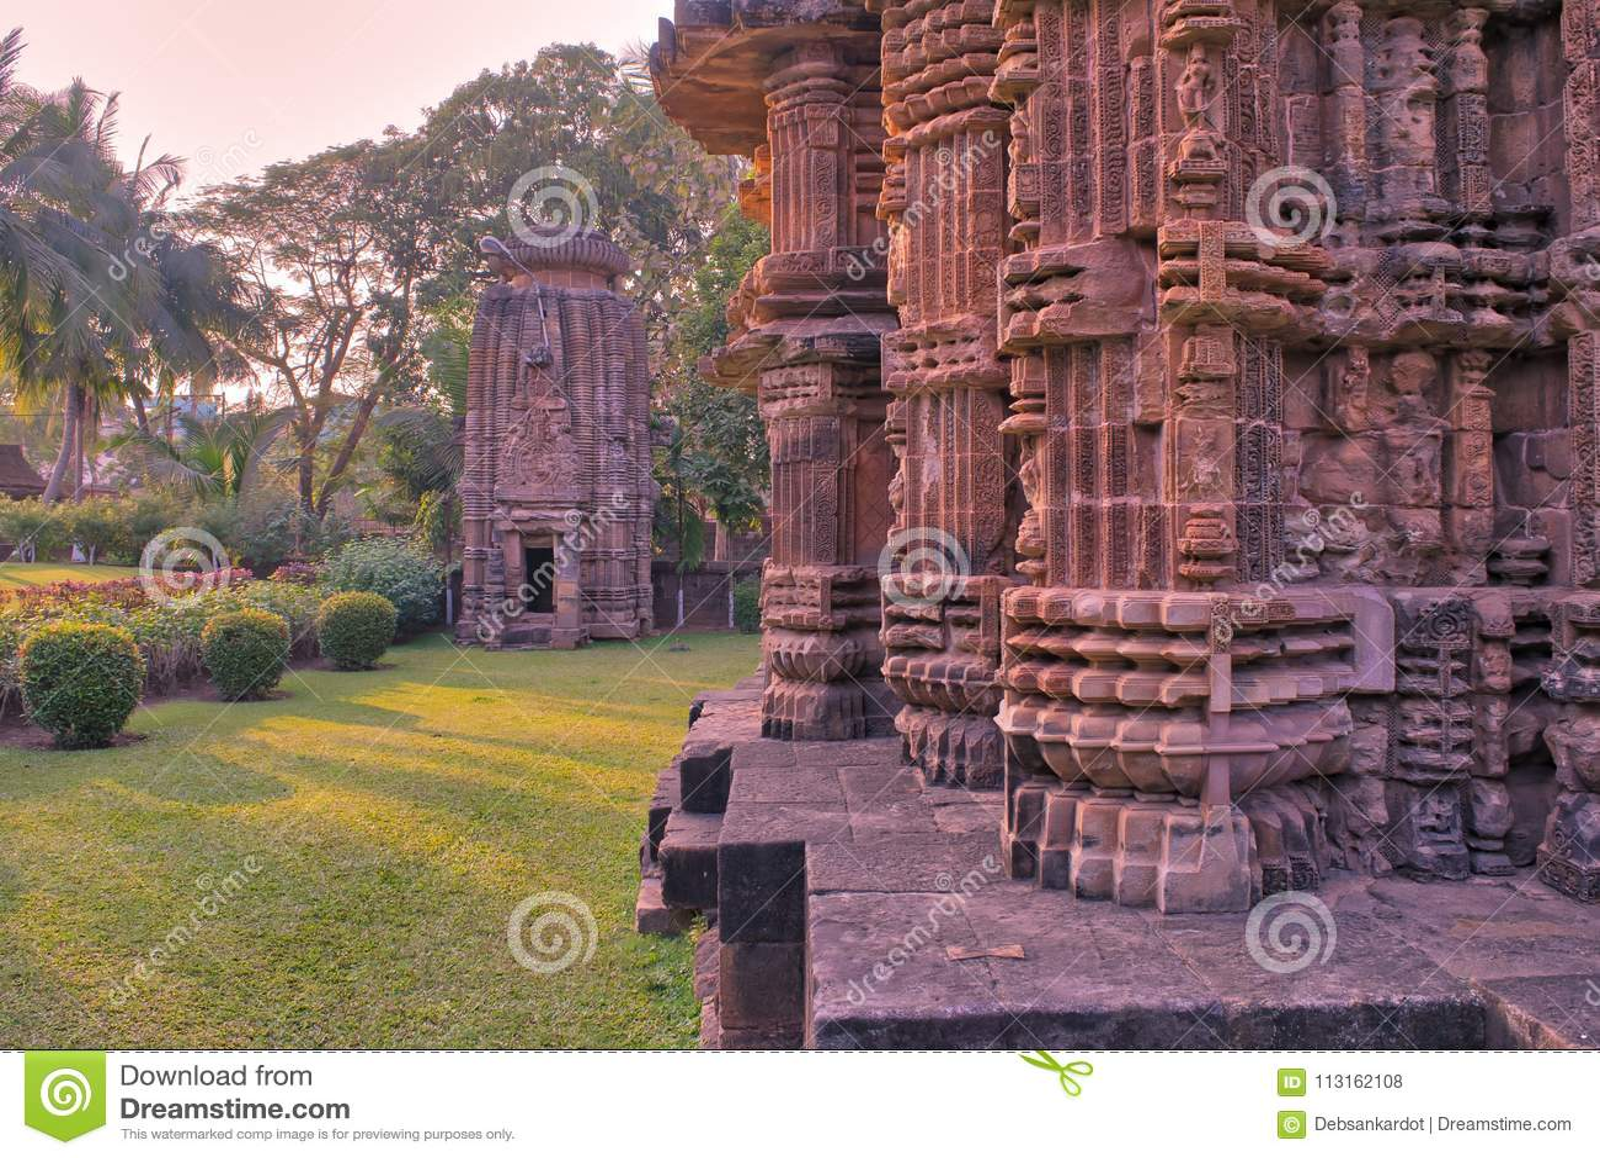 Chitrakarini Bhubaneswar Odisha India Świątynna Hinduska religia